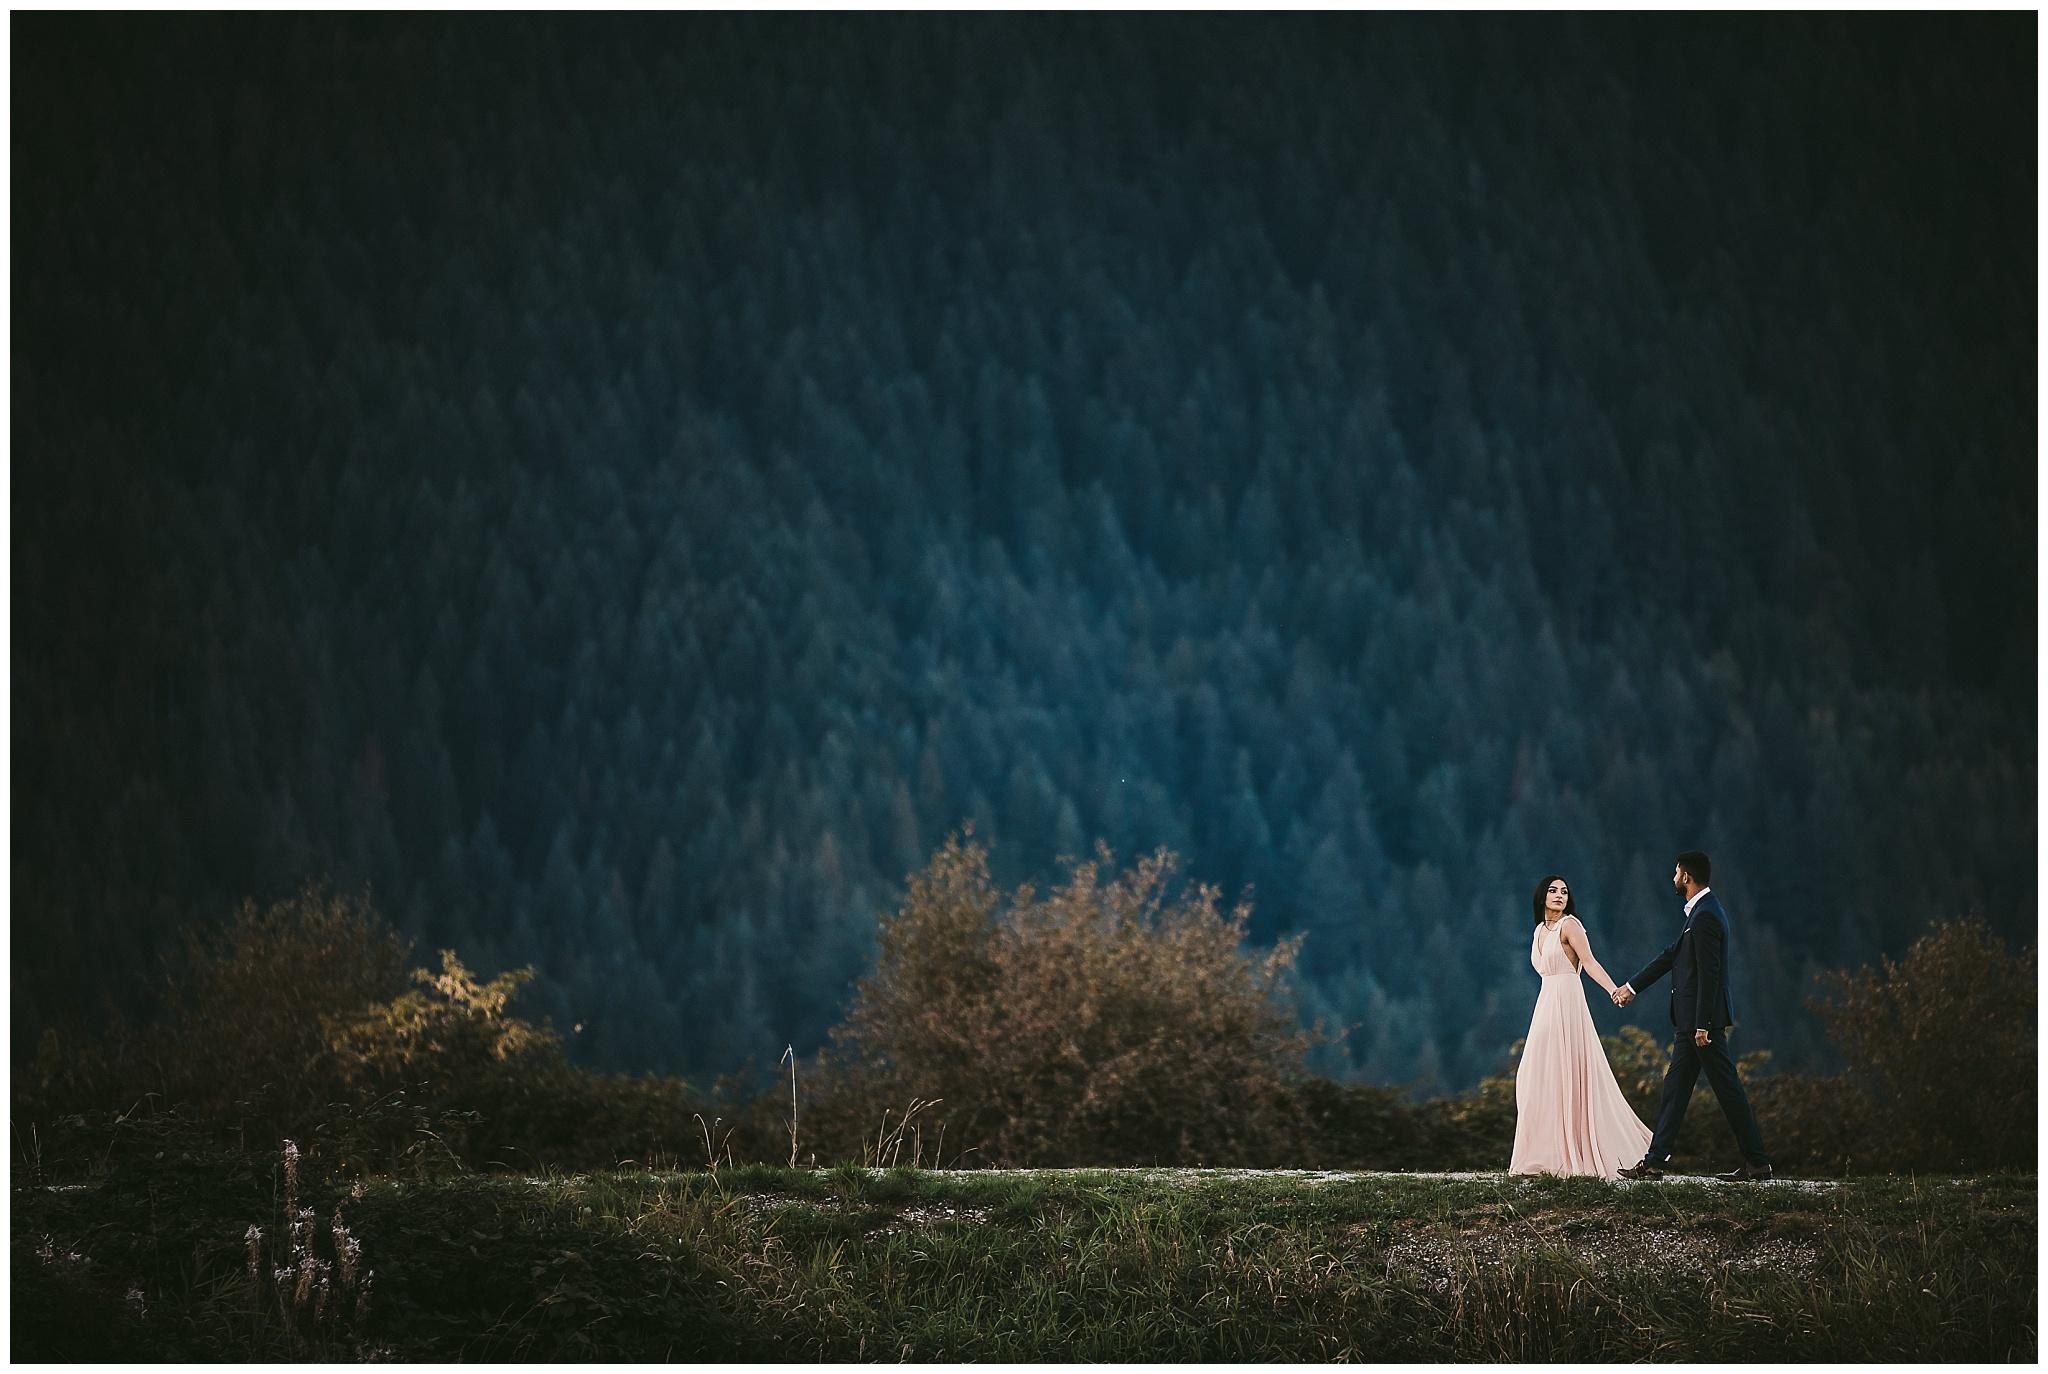 Maple-Ridge-Engagement-Photographer-3.jpg